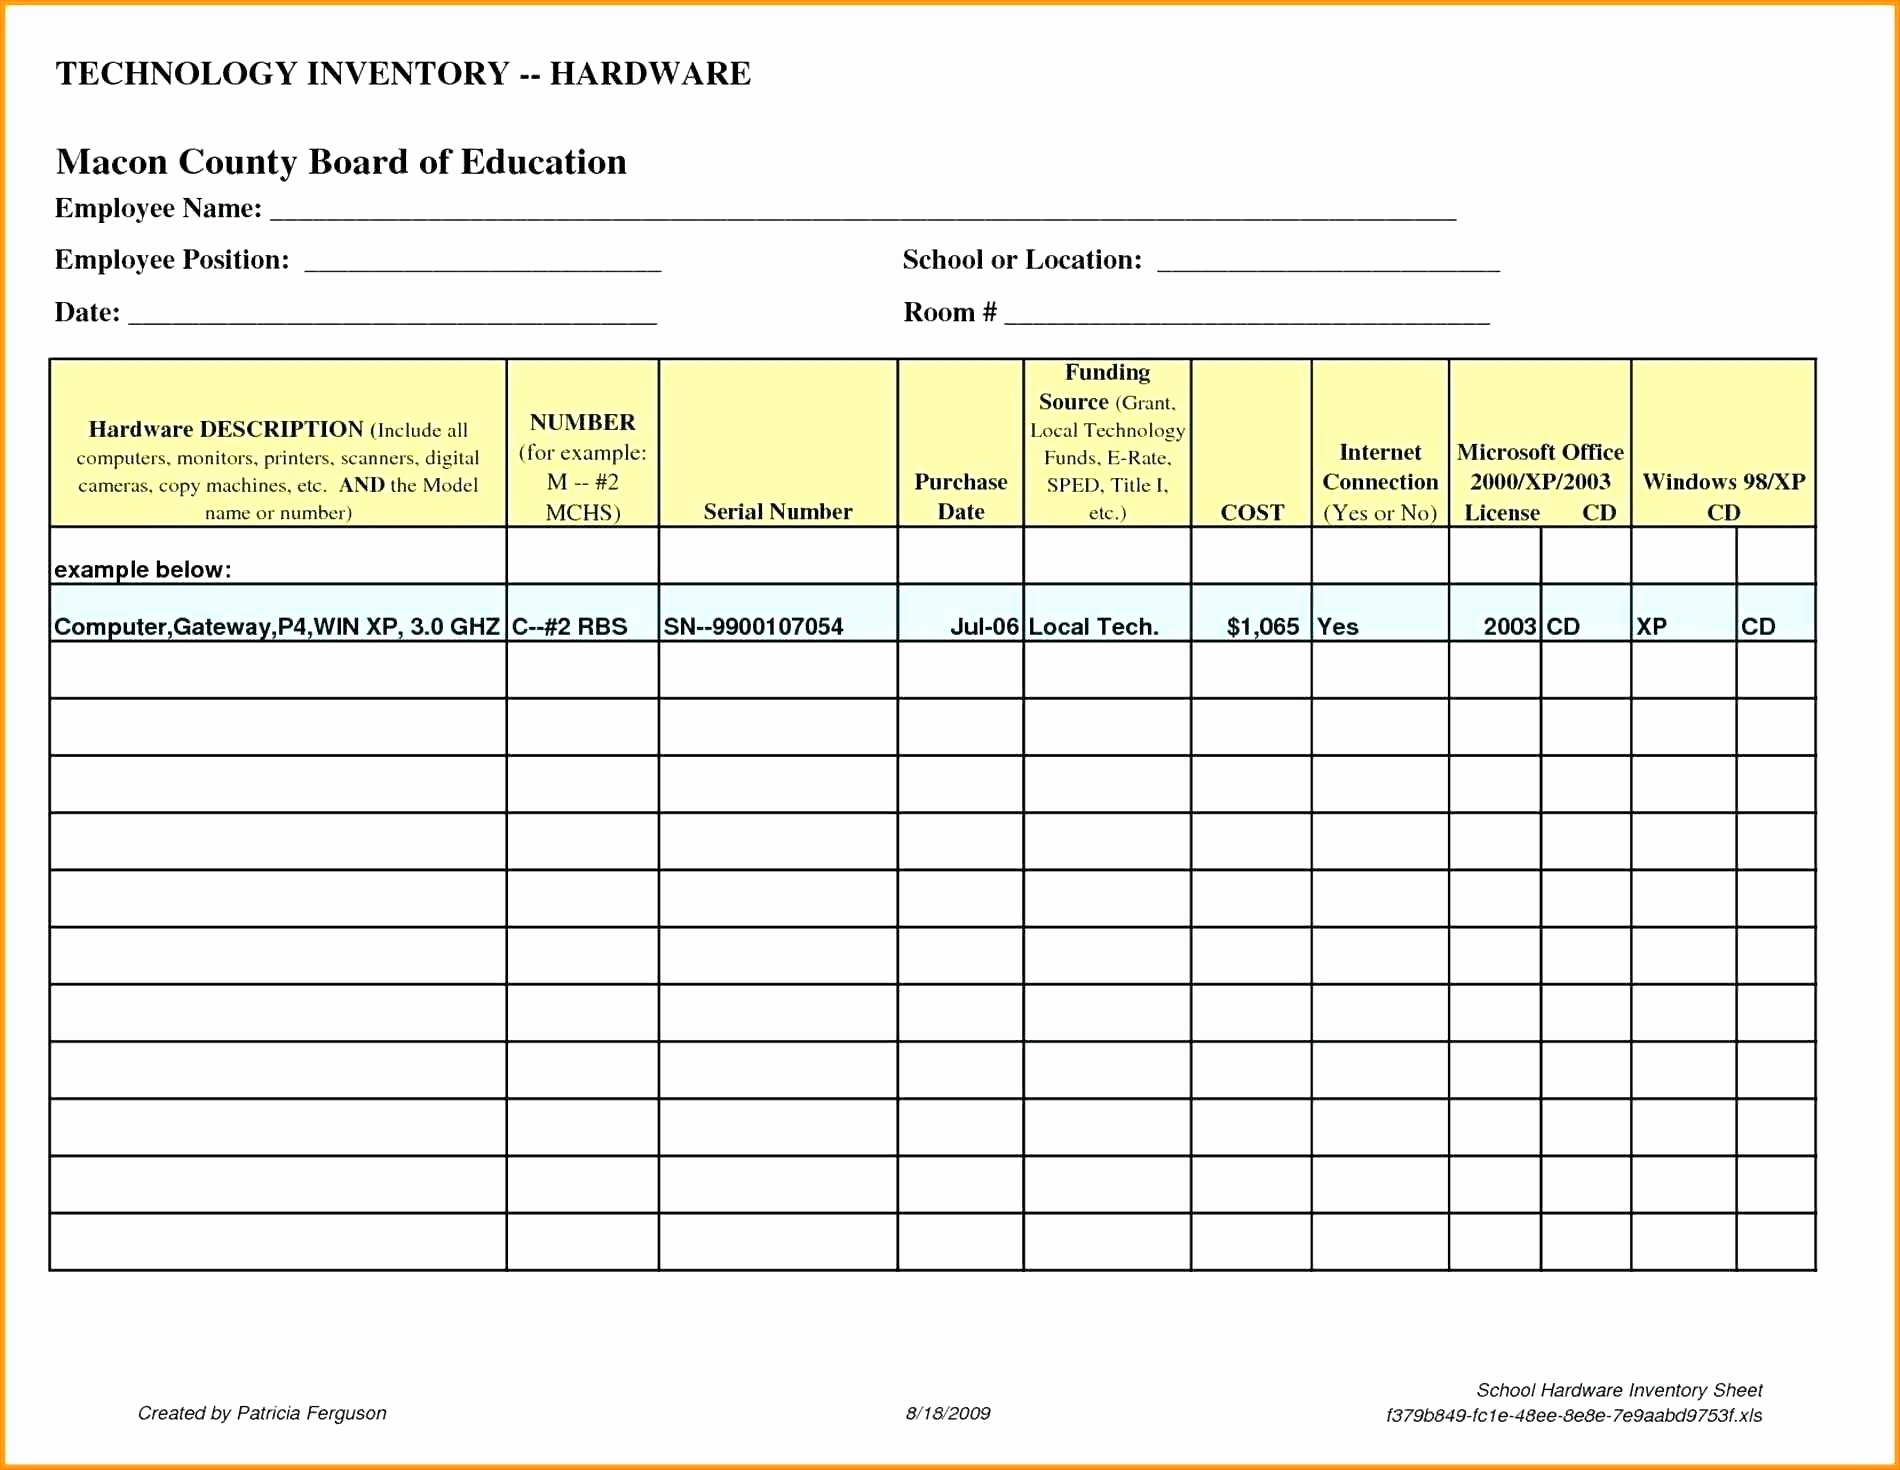 Estate Inventory Spreadsheet Pertaining To Blank Inventory Spreadsheet Luxury Tool Form Guvecurid Of Singular